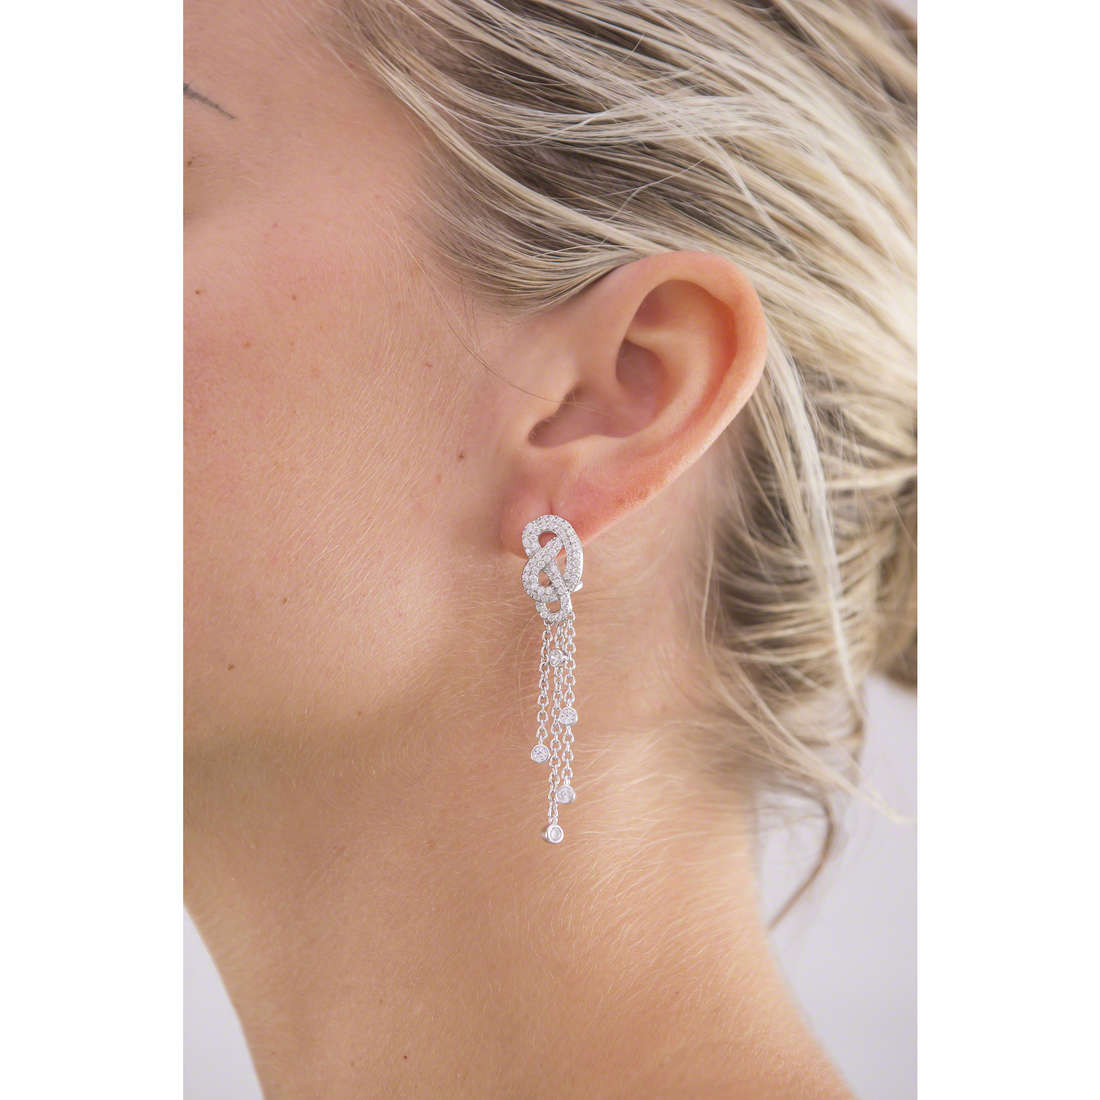 Morellato earrings Nododamore woman SAHN02 photo wearing